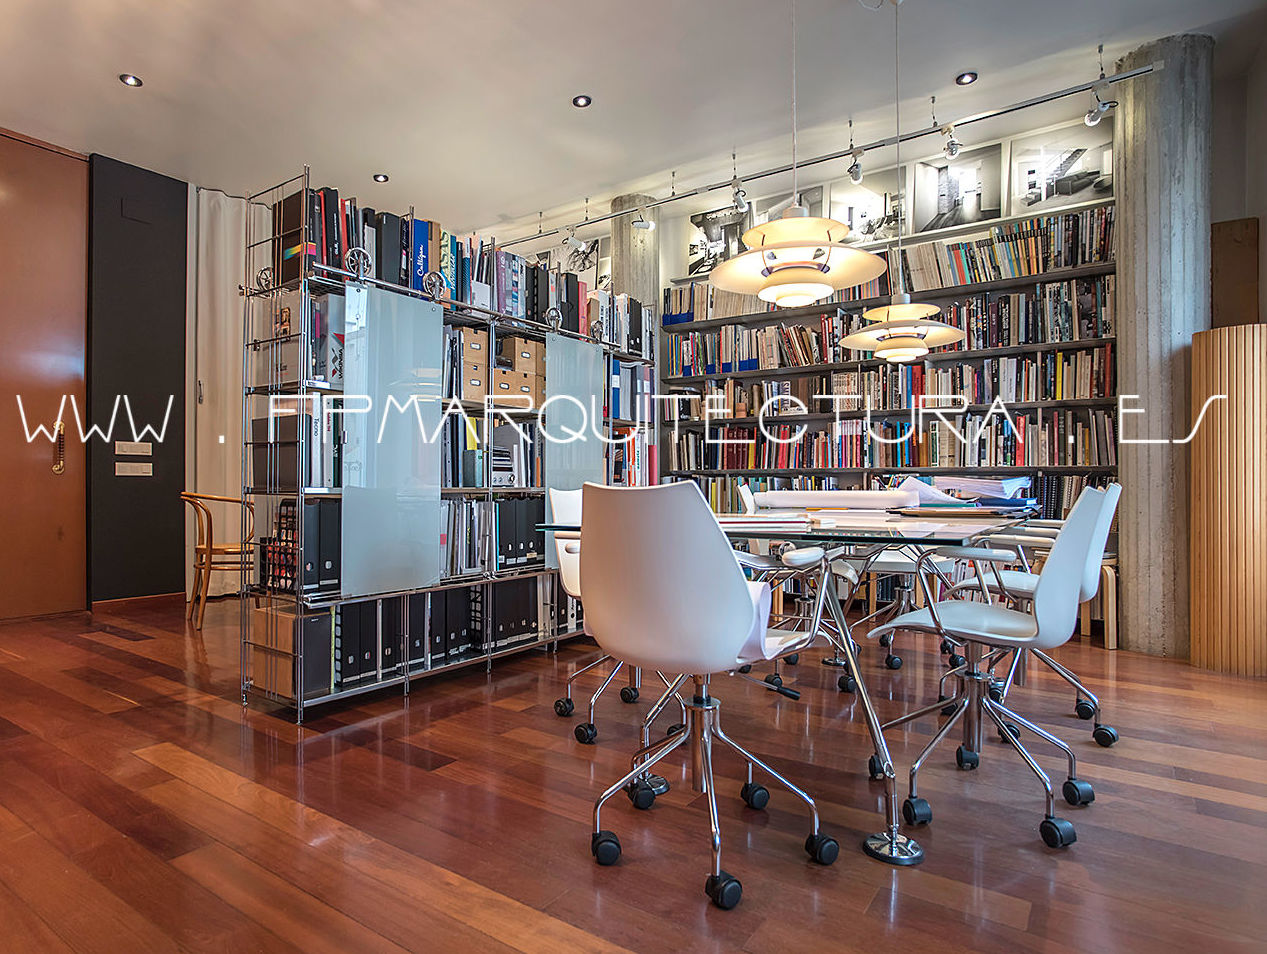 Estudio Sede de FPMarquitectura.es  calle Sant Isidre 21-08870 Sitges Barcelona